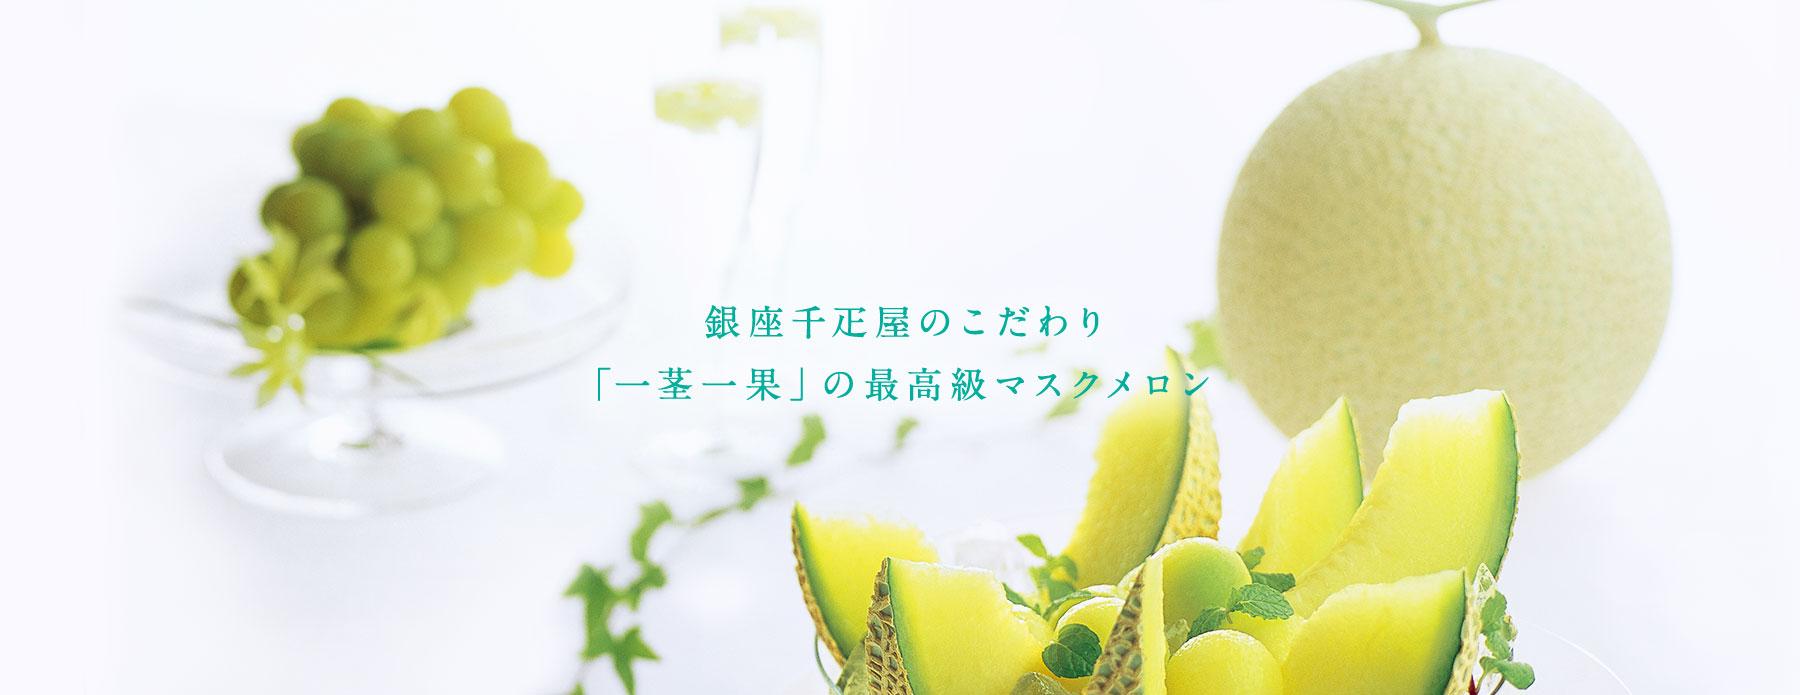 img.home.melon.jpg